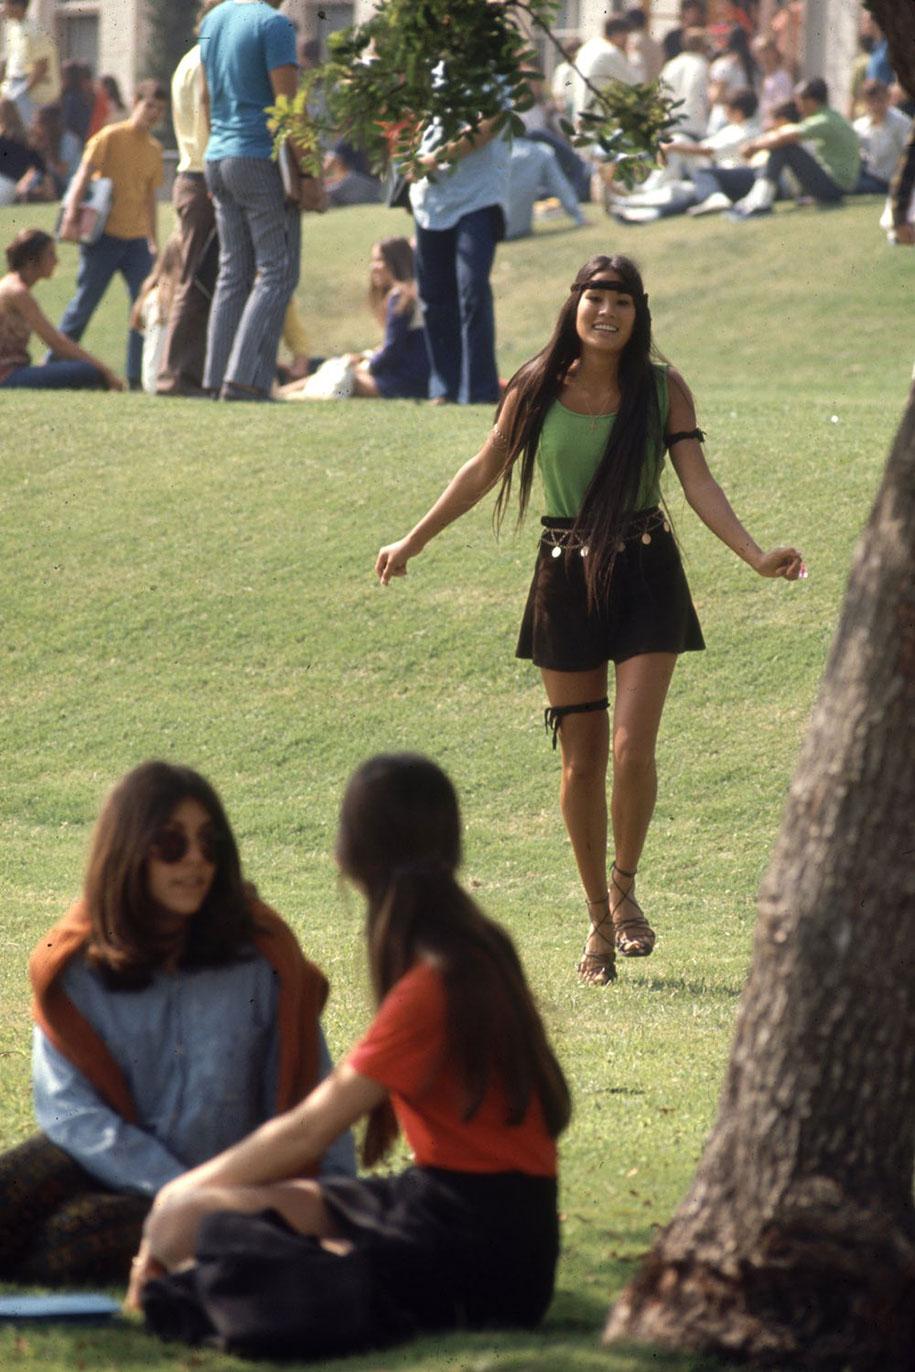 1969-hippie-high-school-counterculture-photography-6